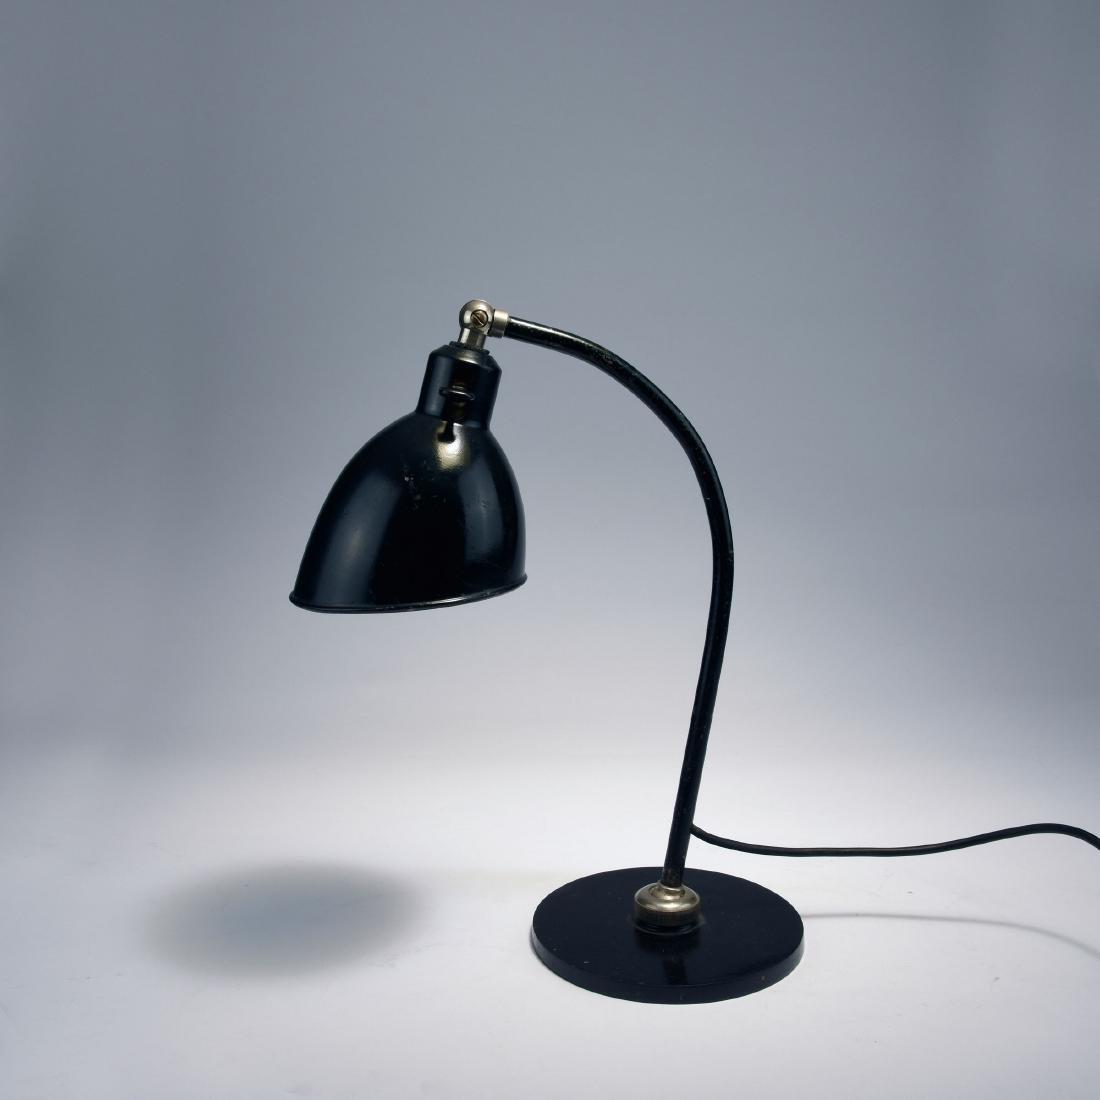 'Polo Populär' table light, 1931 - 3